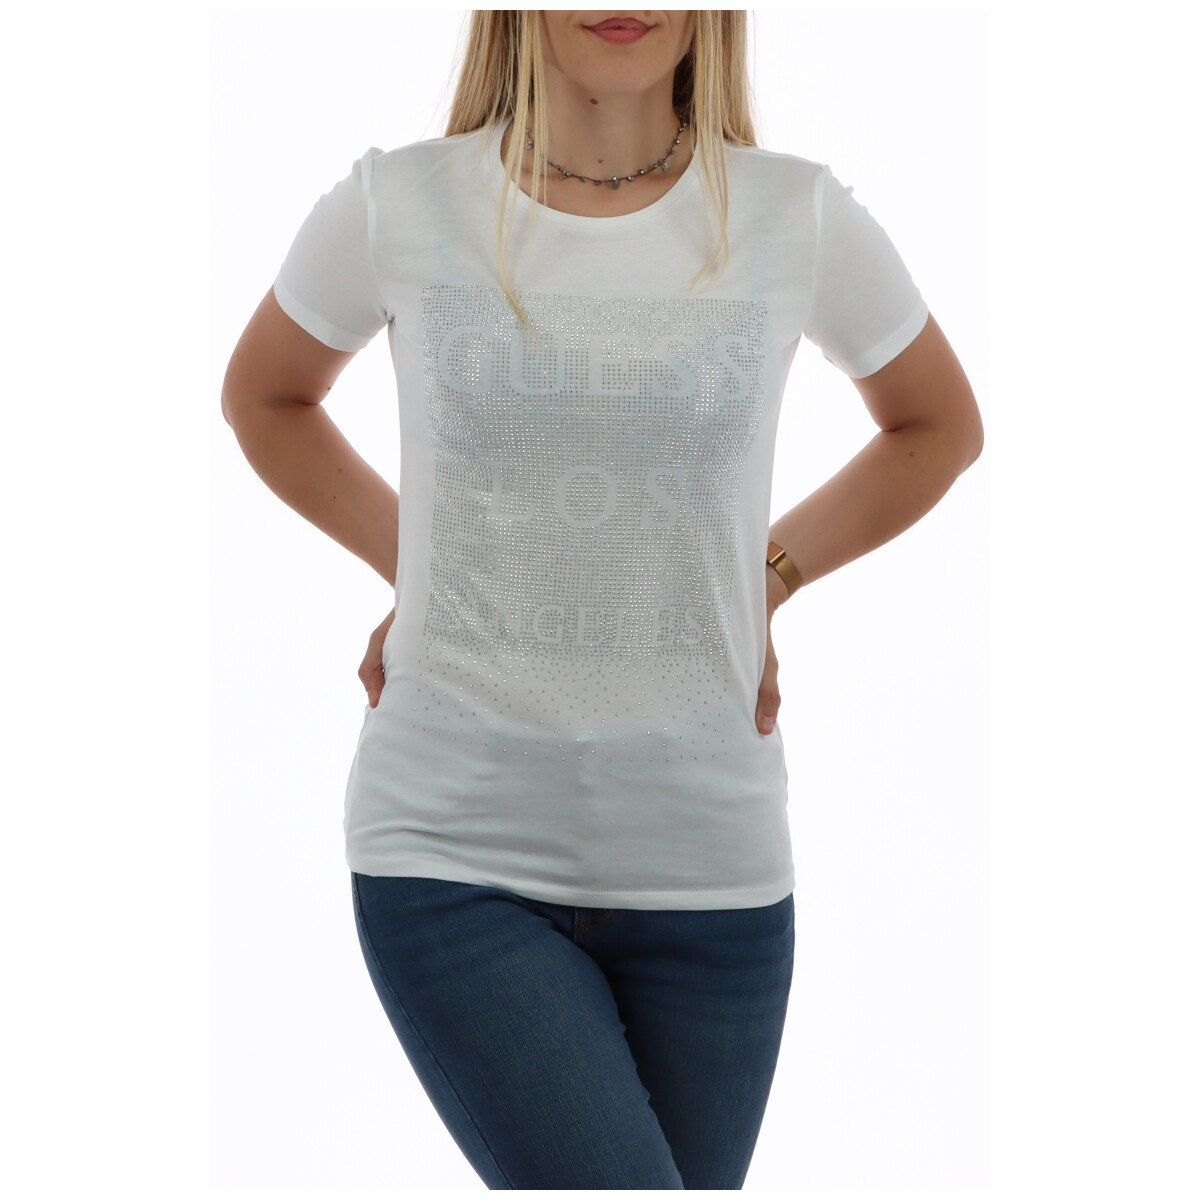 Guess Women's T-Shirt Various Colours 258492 - white XS